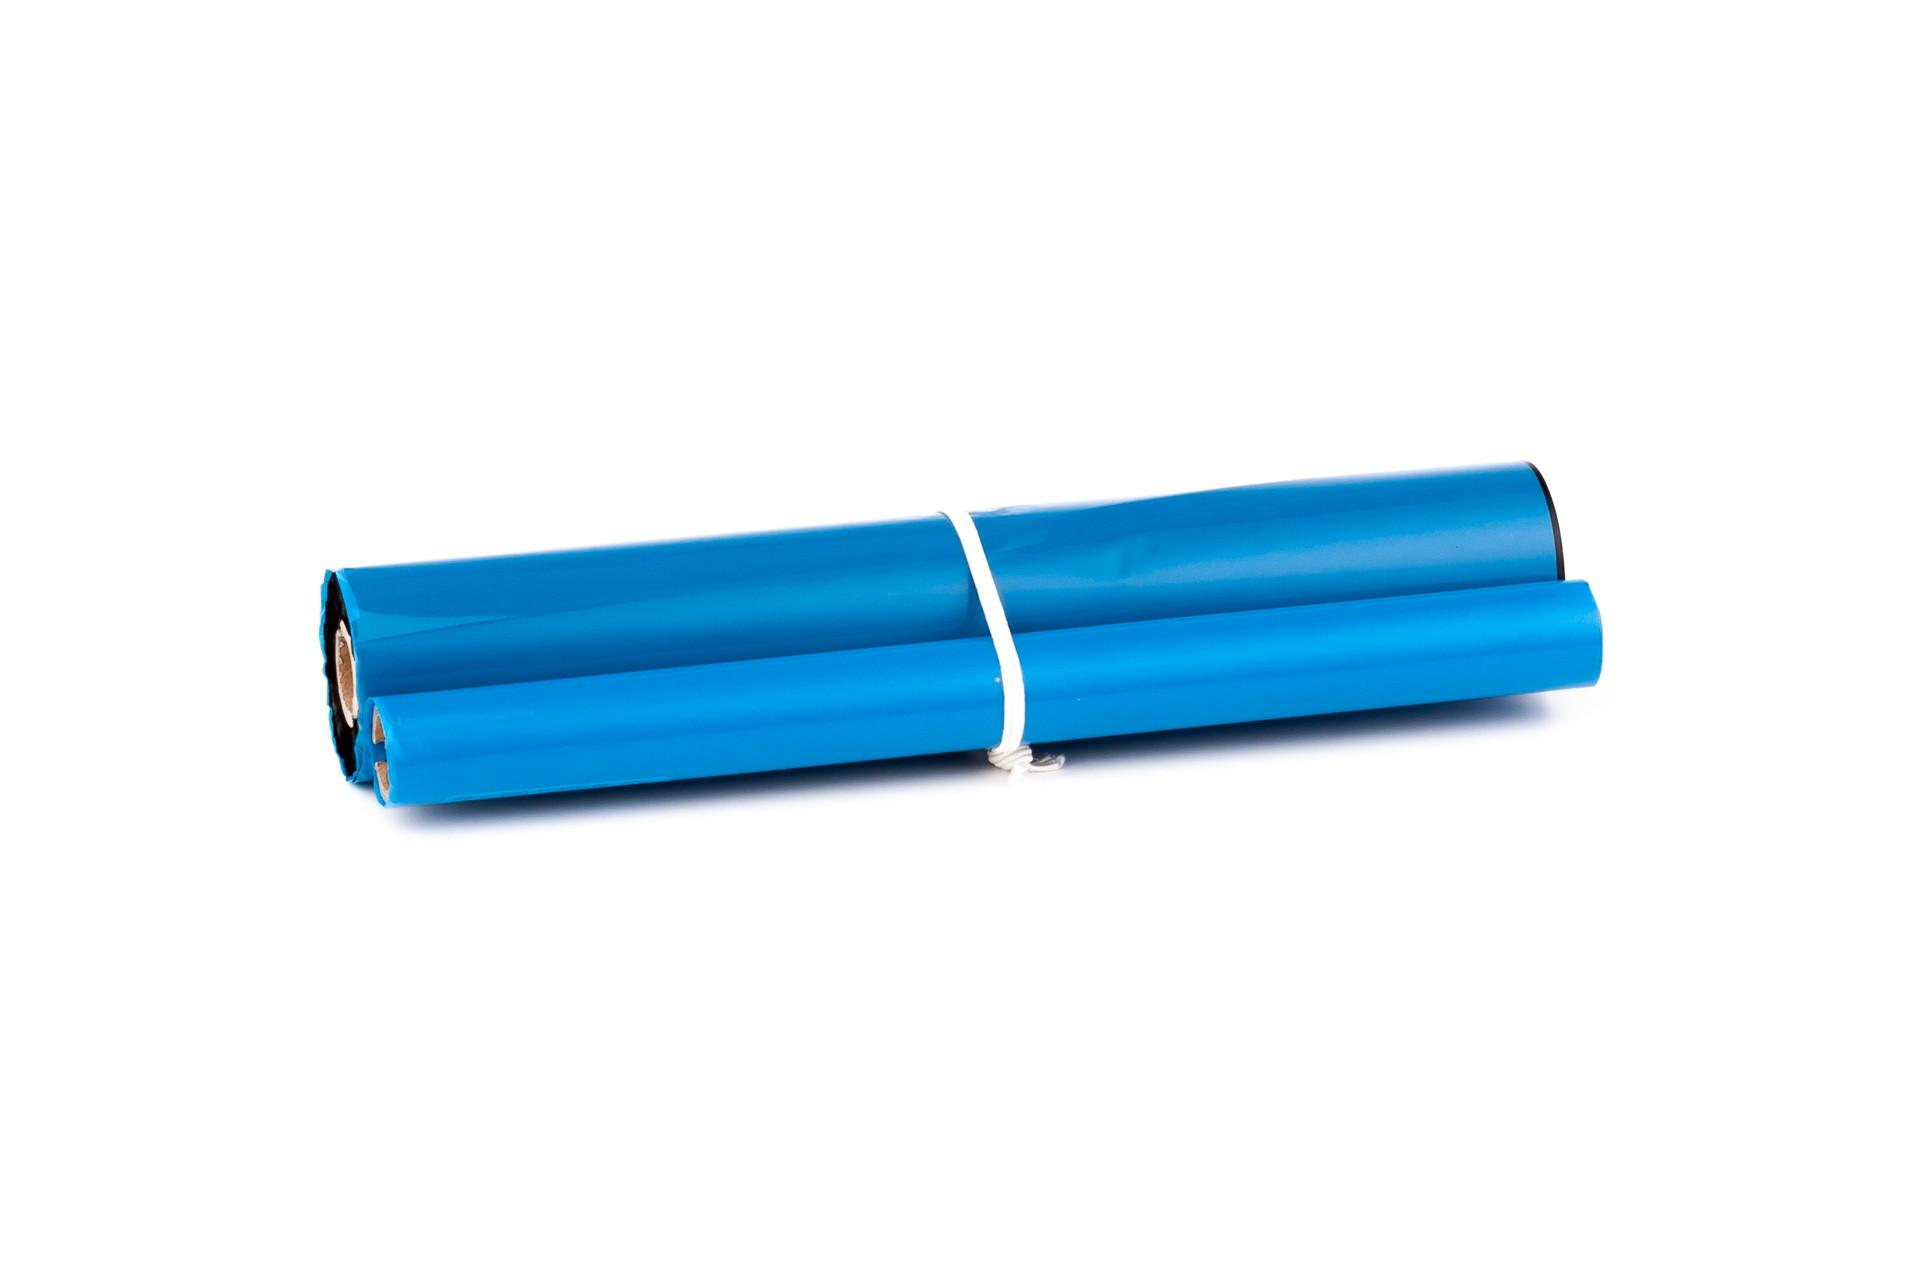 Ruban de telecopieur (alternatif) compatible à Brother PC 302 RF / Twinpack  / Brother FAX 750 / 760 / 770 / 870 MC / 910 / 920 / 921 / 930 / 931 / 940 Email / Intellifax 750 / 770 / 775 / 870 / 870 MC / 885 MC / MFC 870 MC / etc.